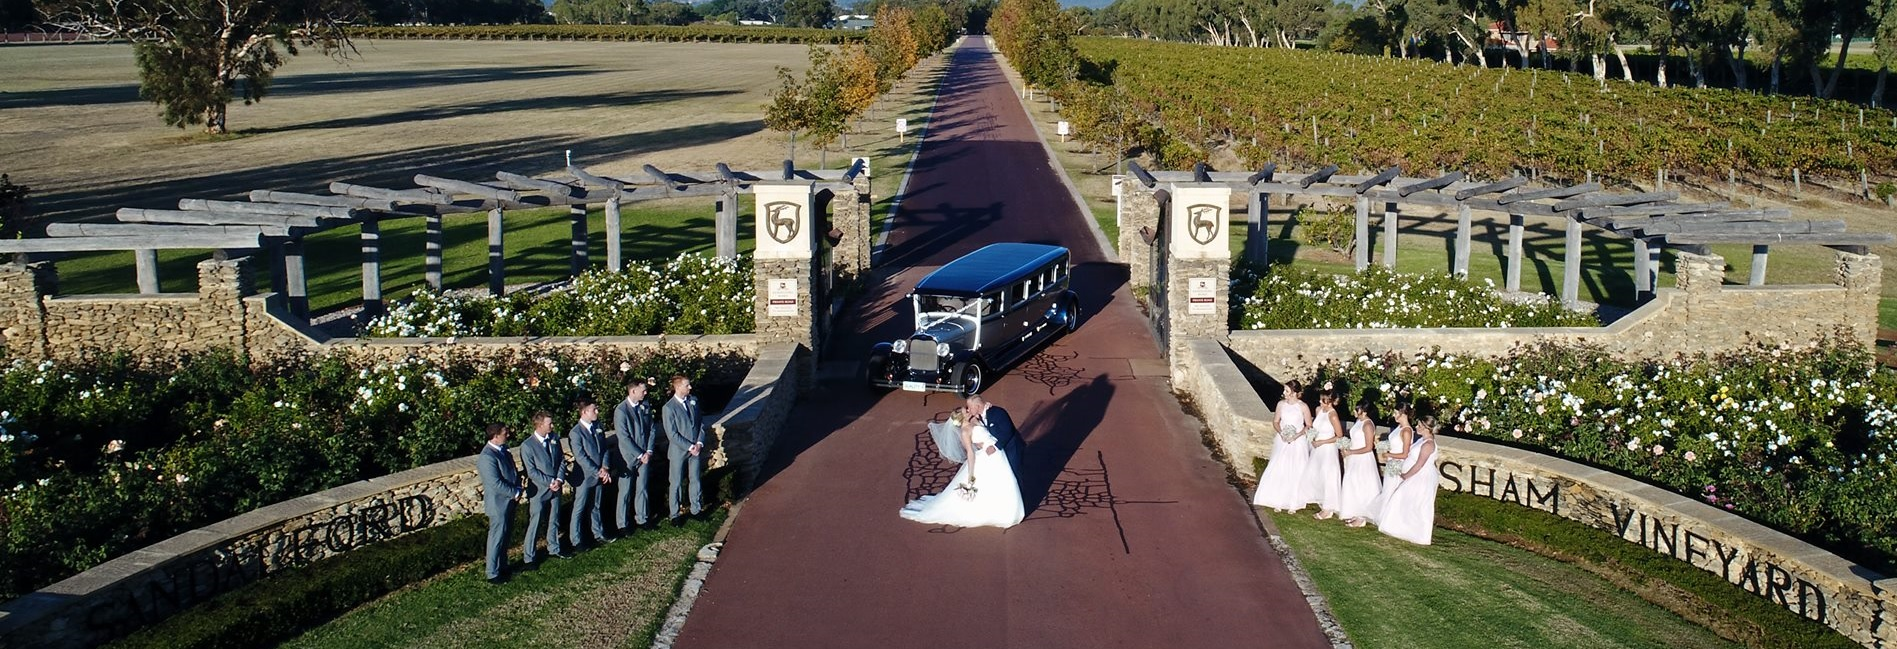 Perth Limo Hire, Vintage Limousines' Wedding Cars, School Ball Limo